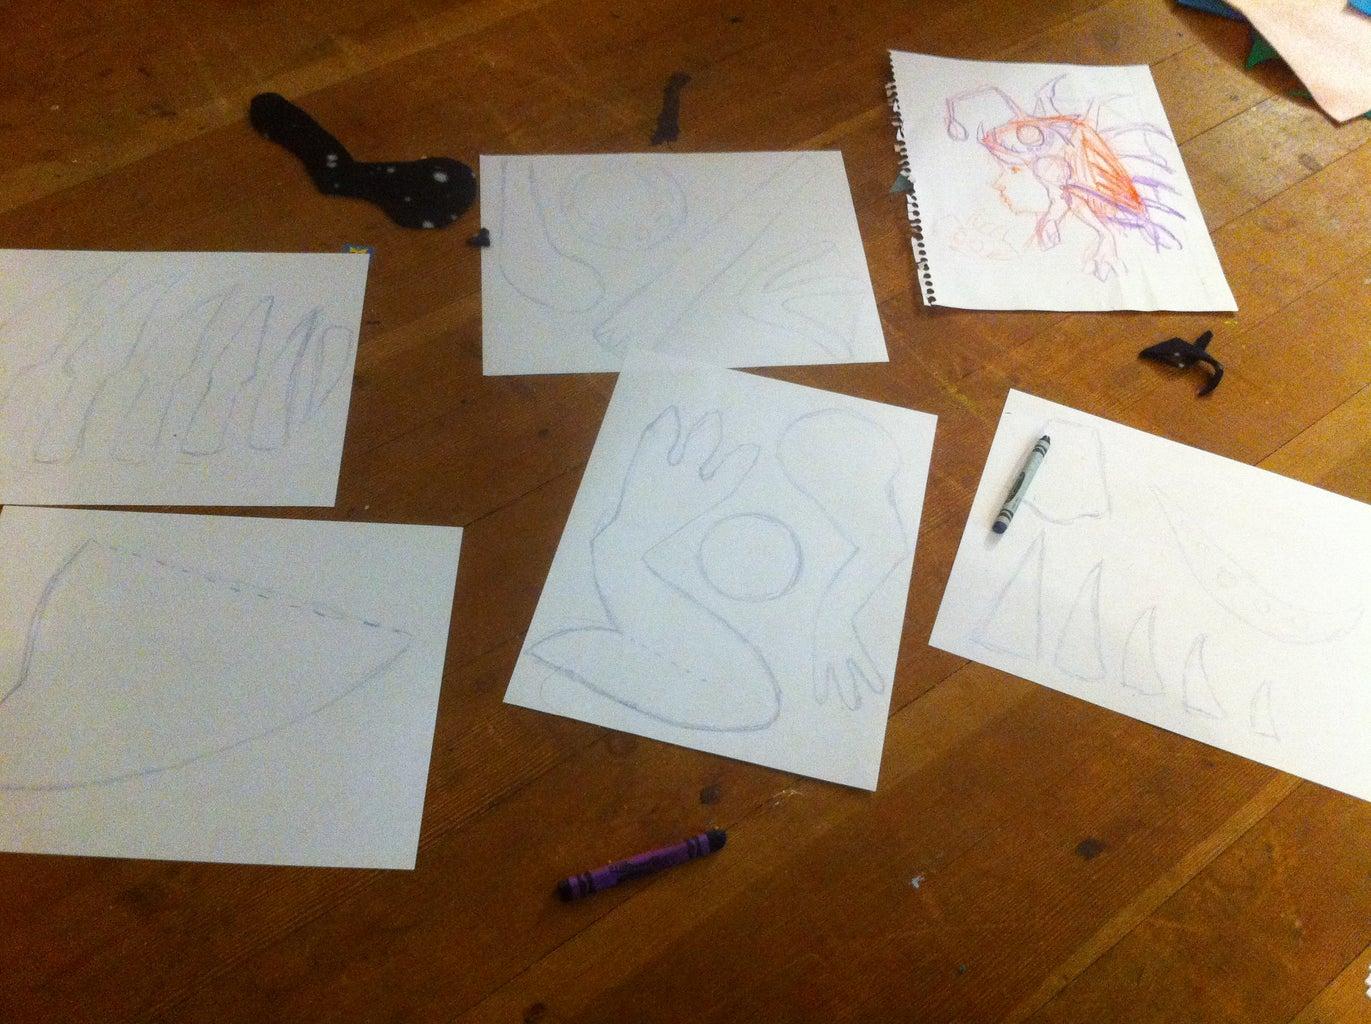 Designing Process